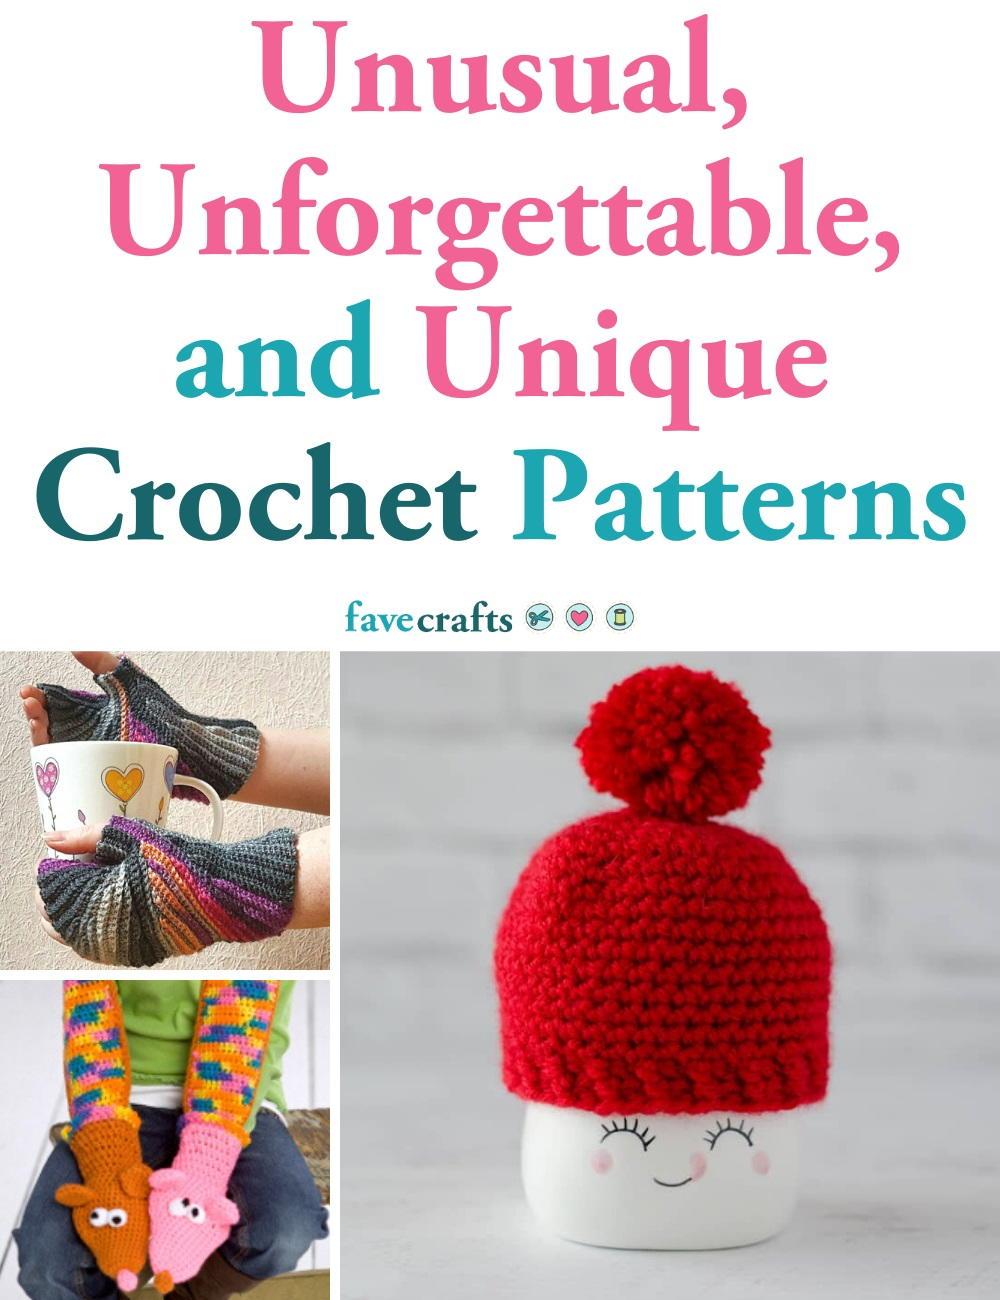 Small KnittingCrochet Project Drawstring Bag Daisies on Gray